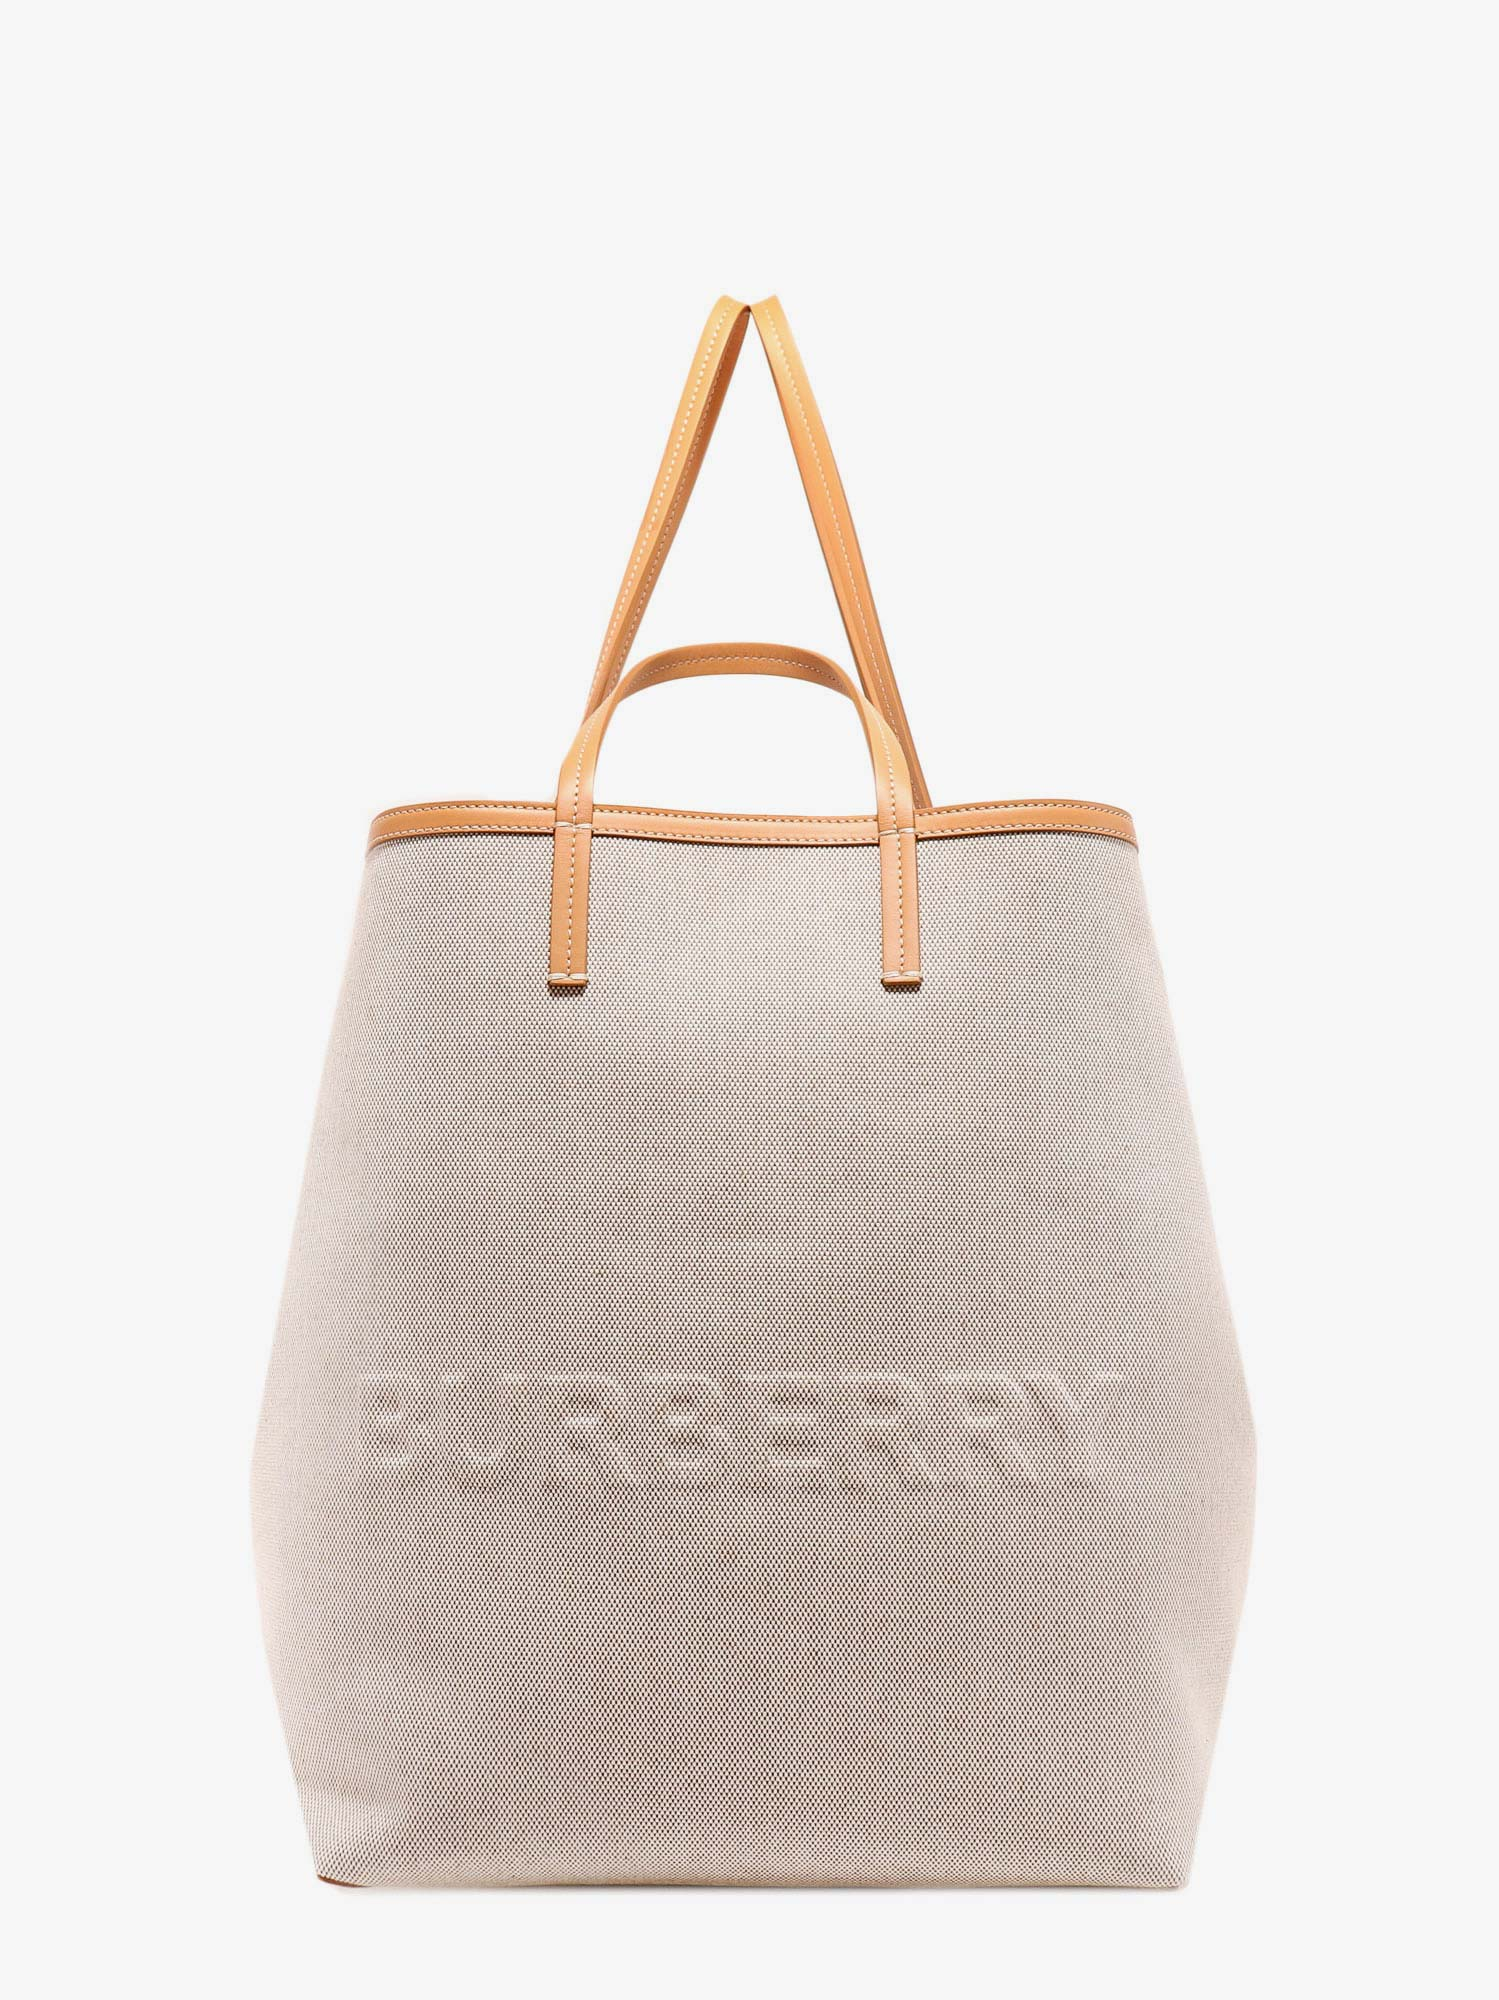 BURBERRY手提包